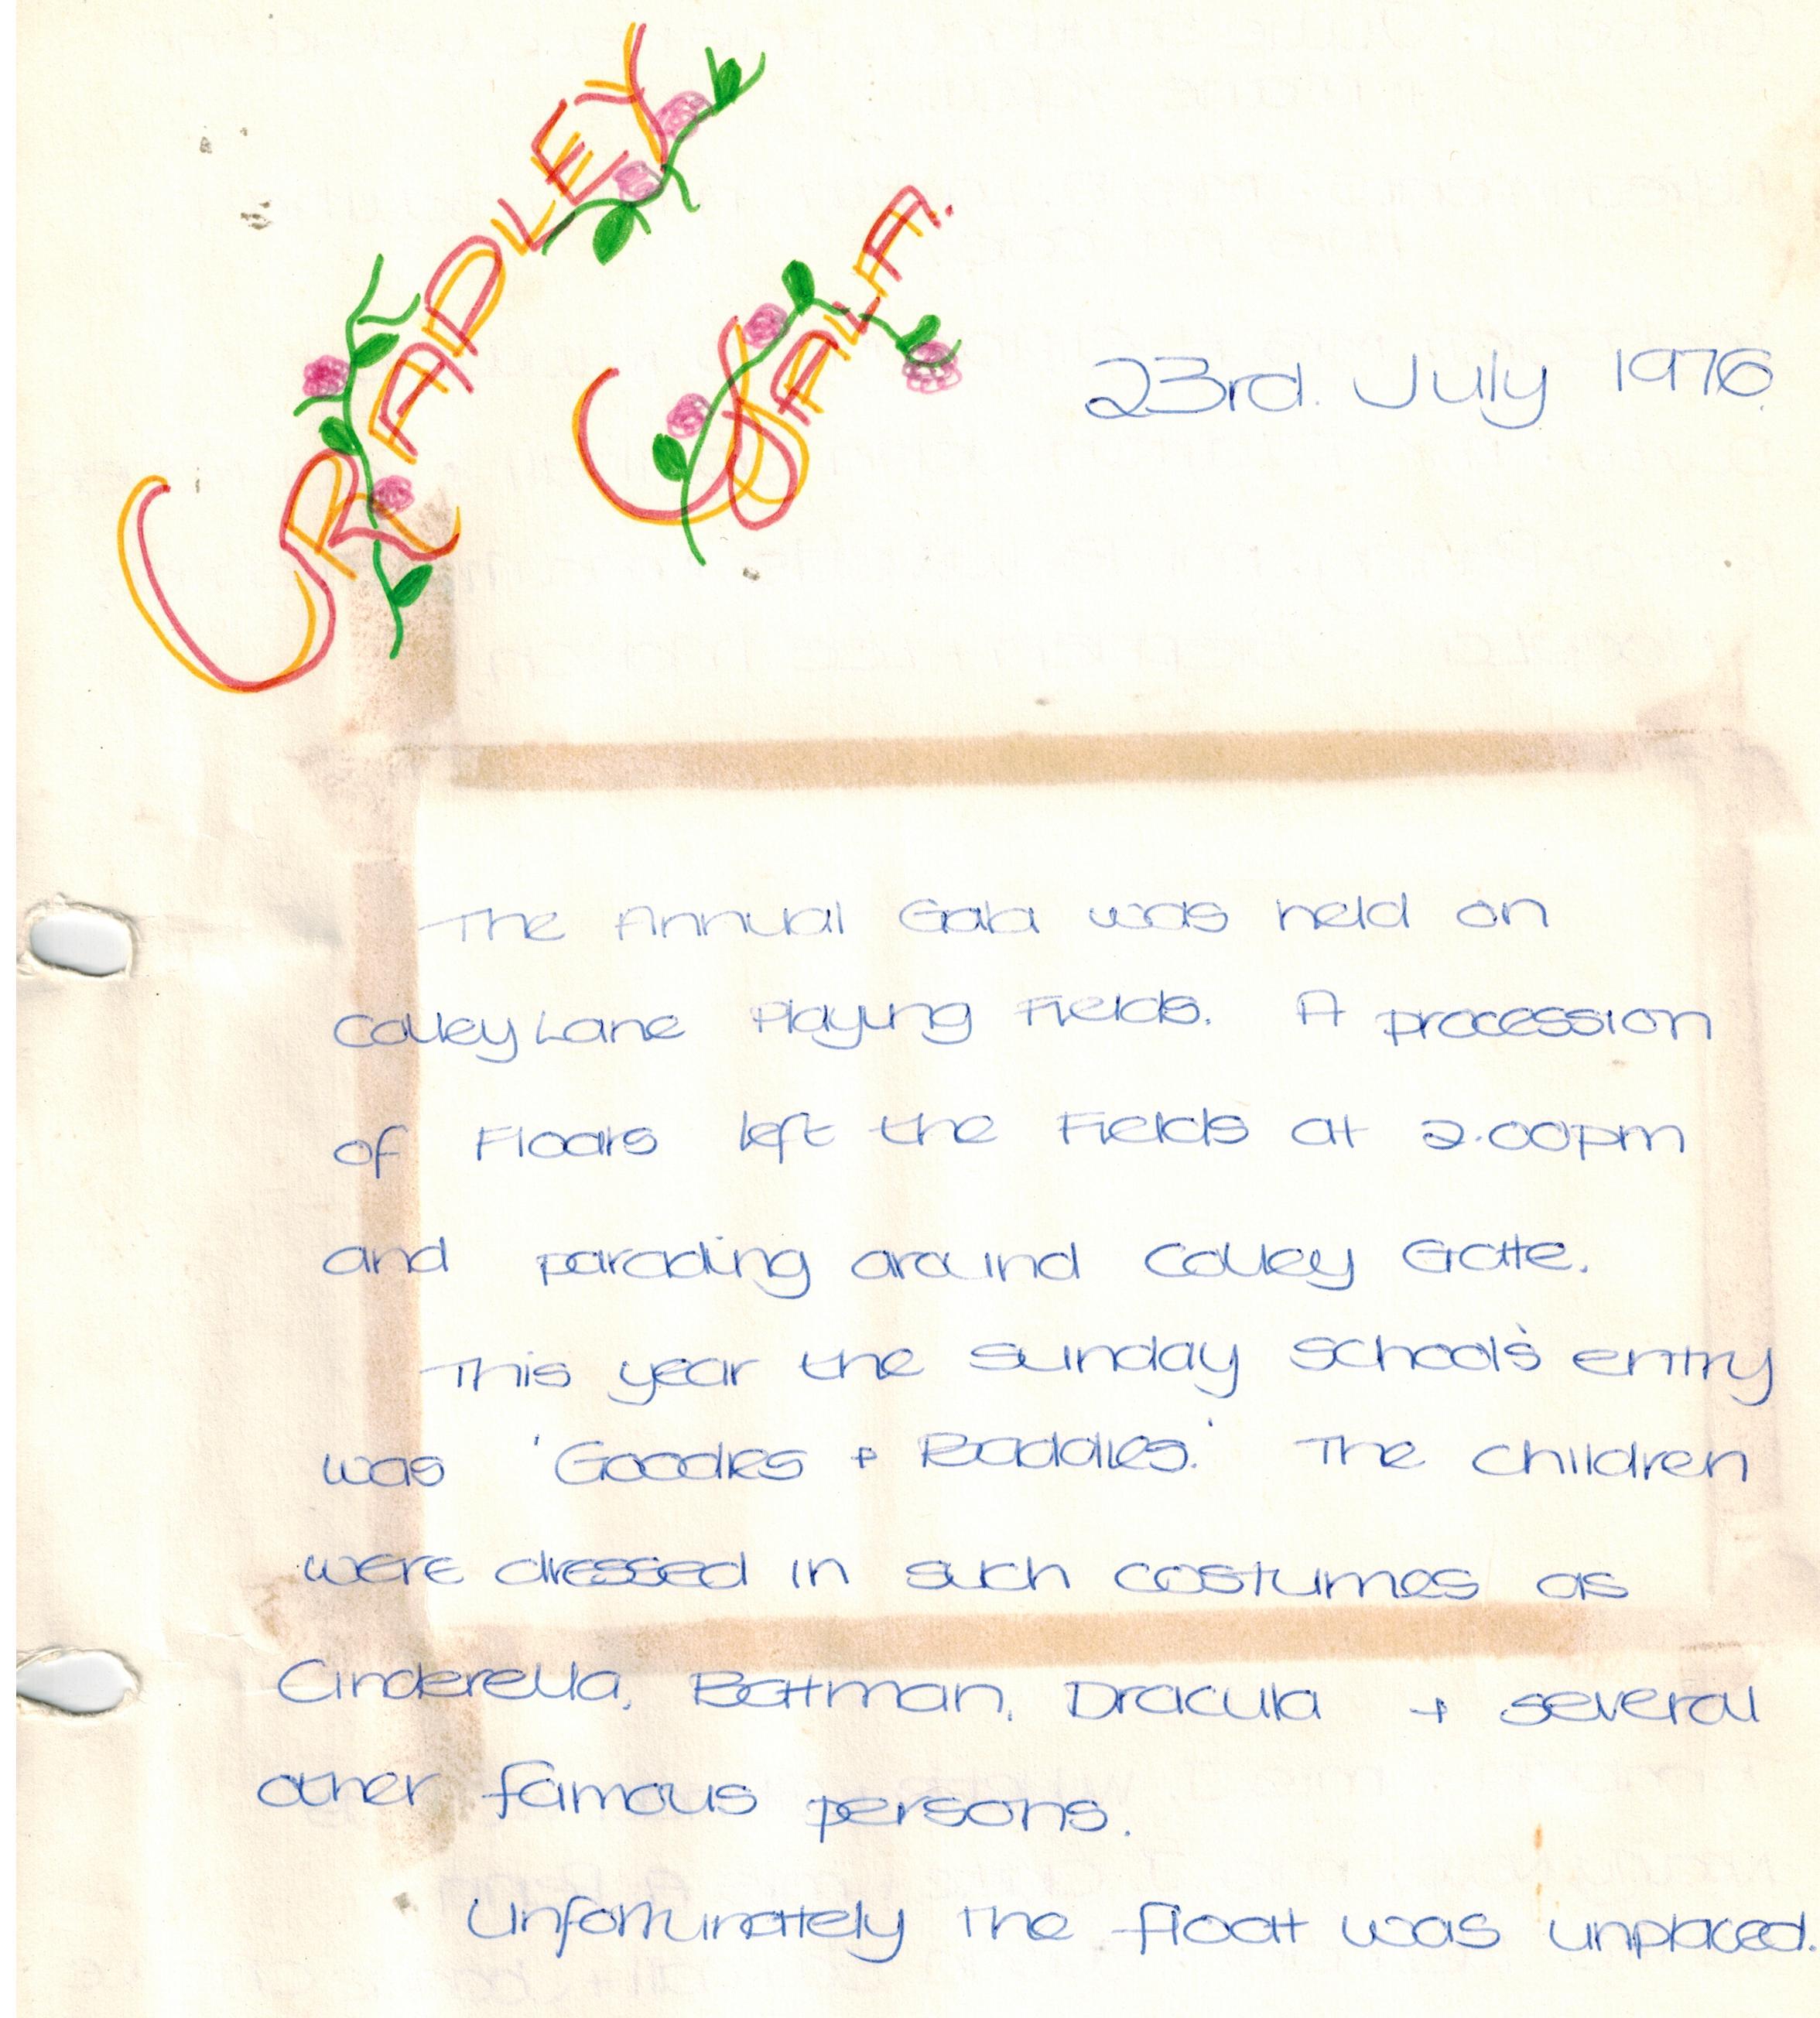 P018a_Cradley-Gala-[1976_07-23]